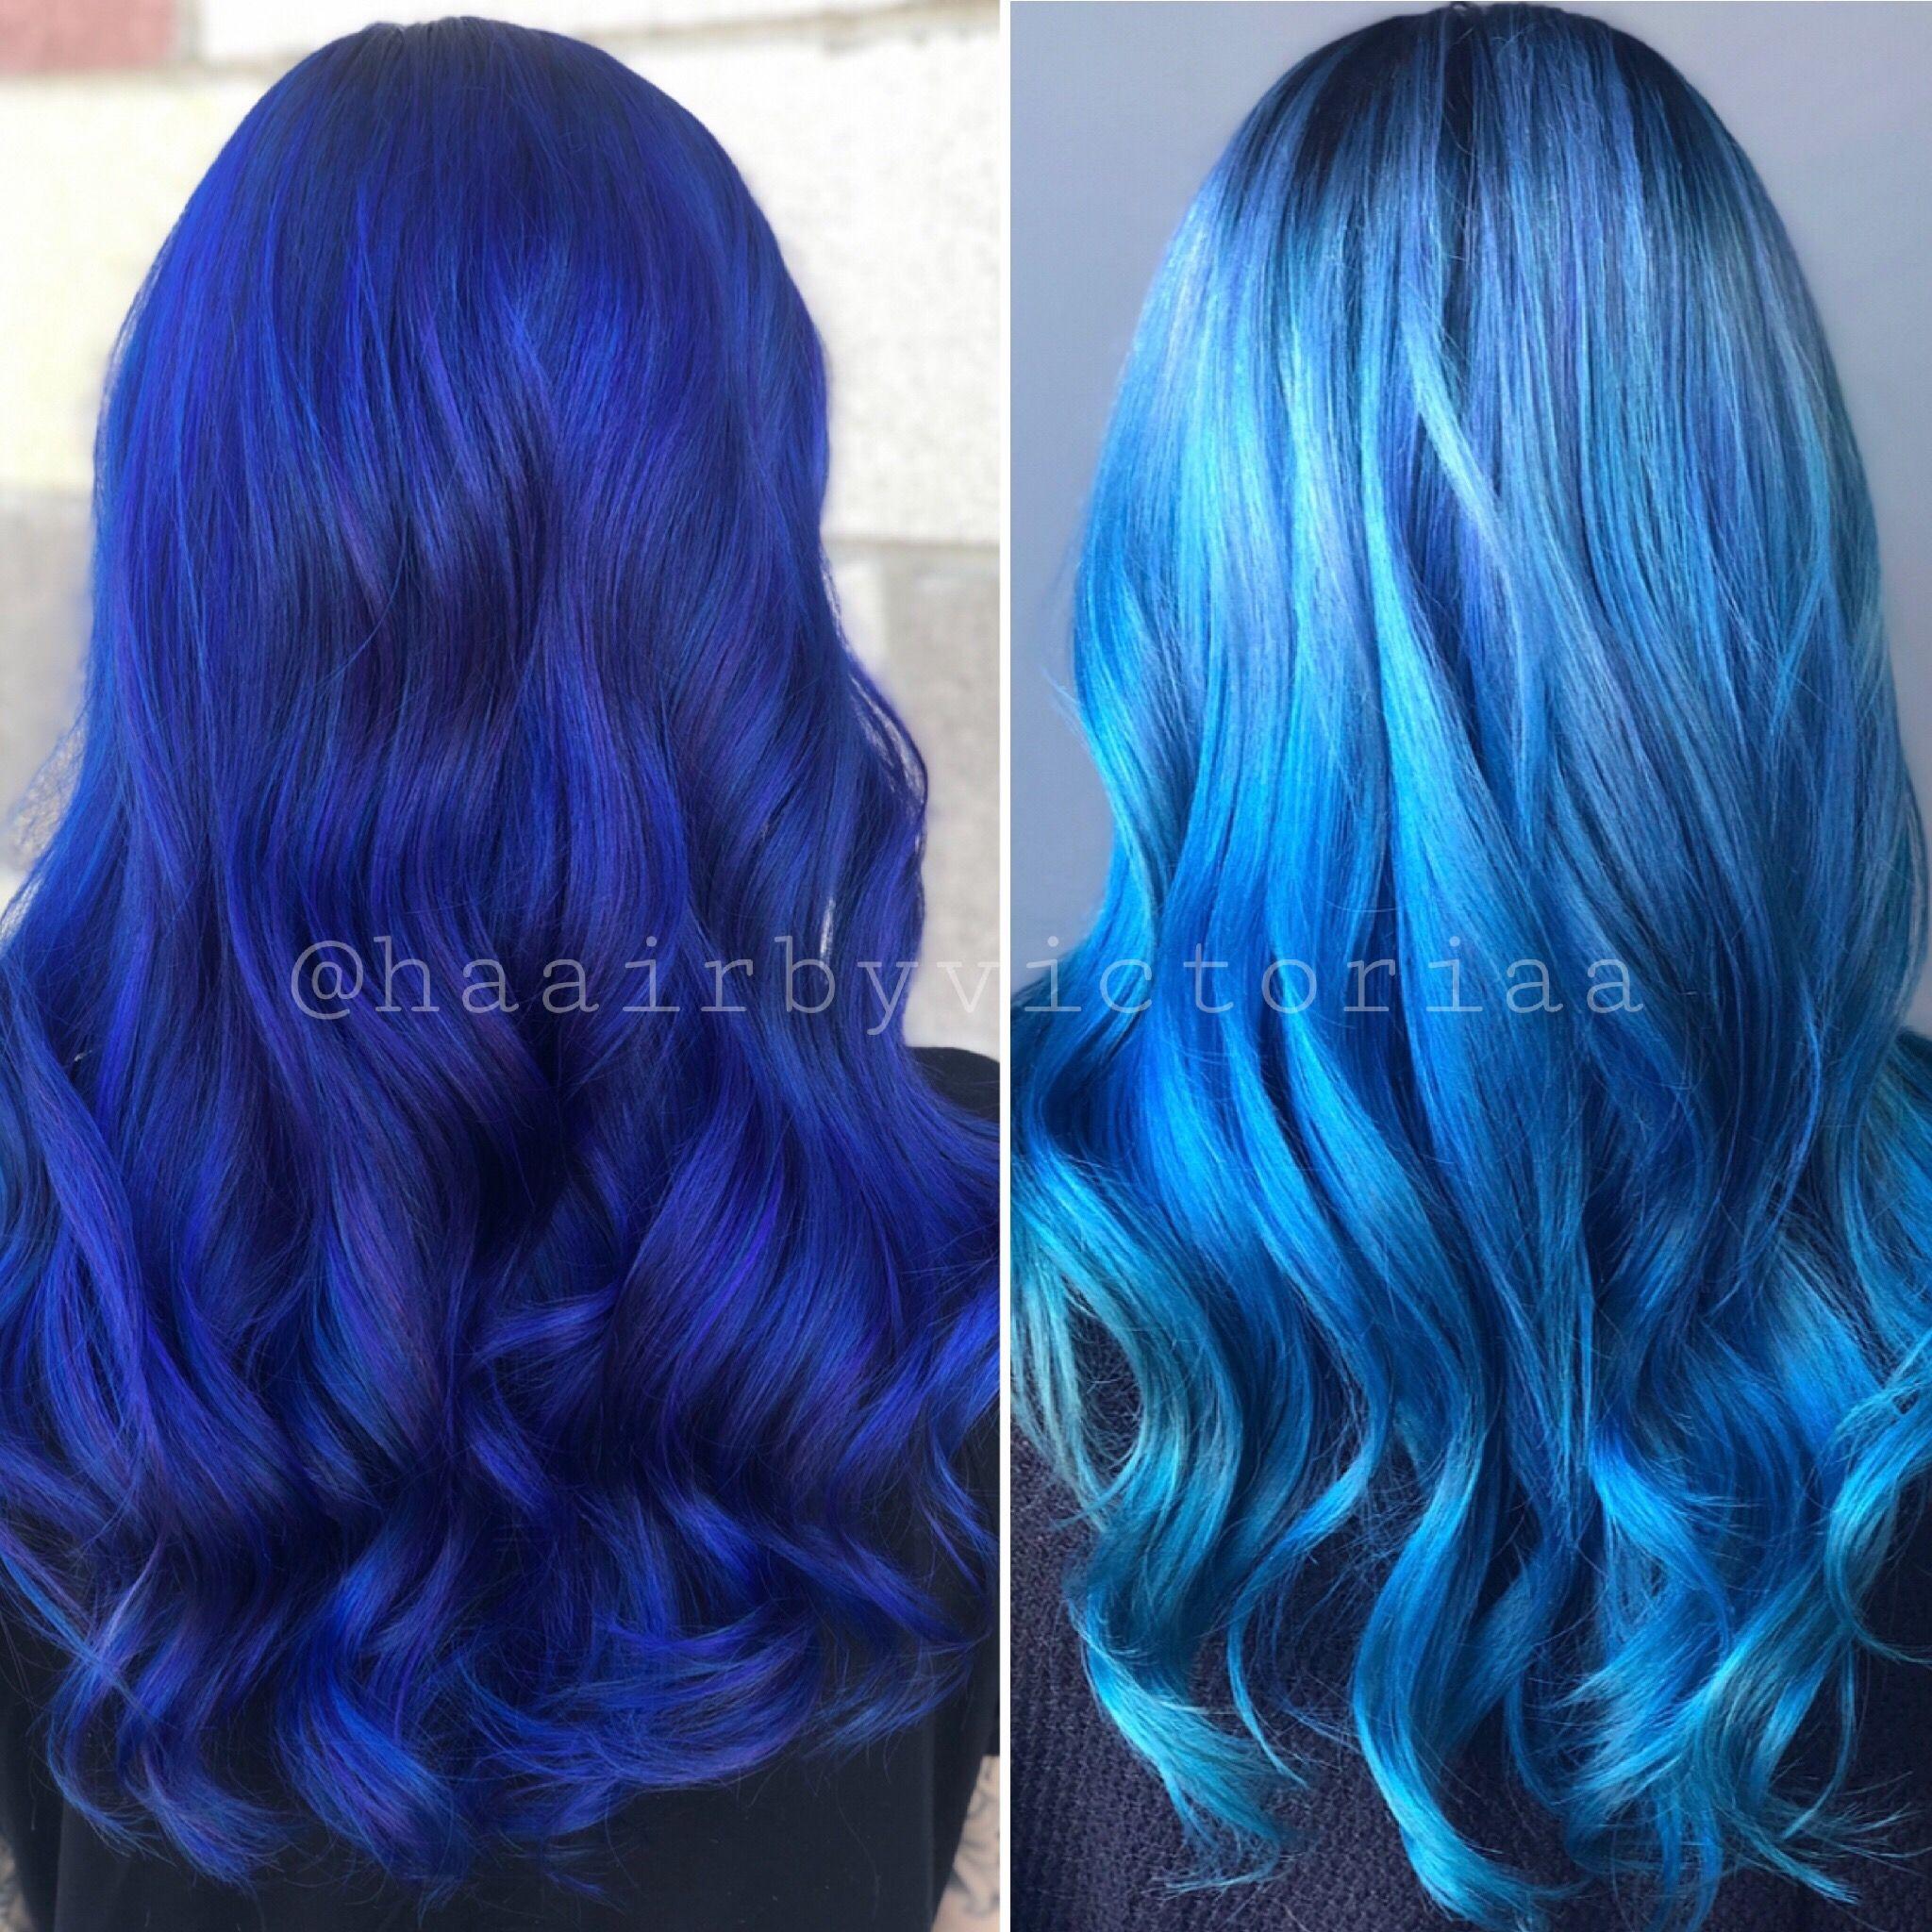 11 Week Fade Out Using Pravana Bluehair Pravana Haircolor Hair